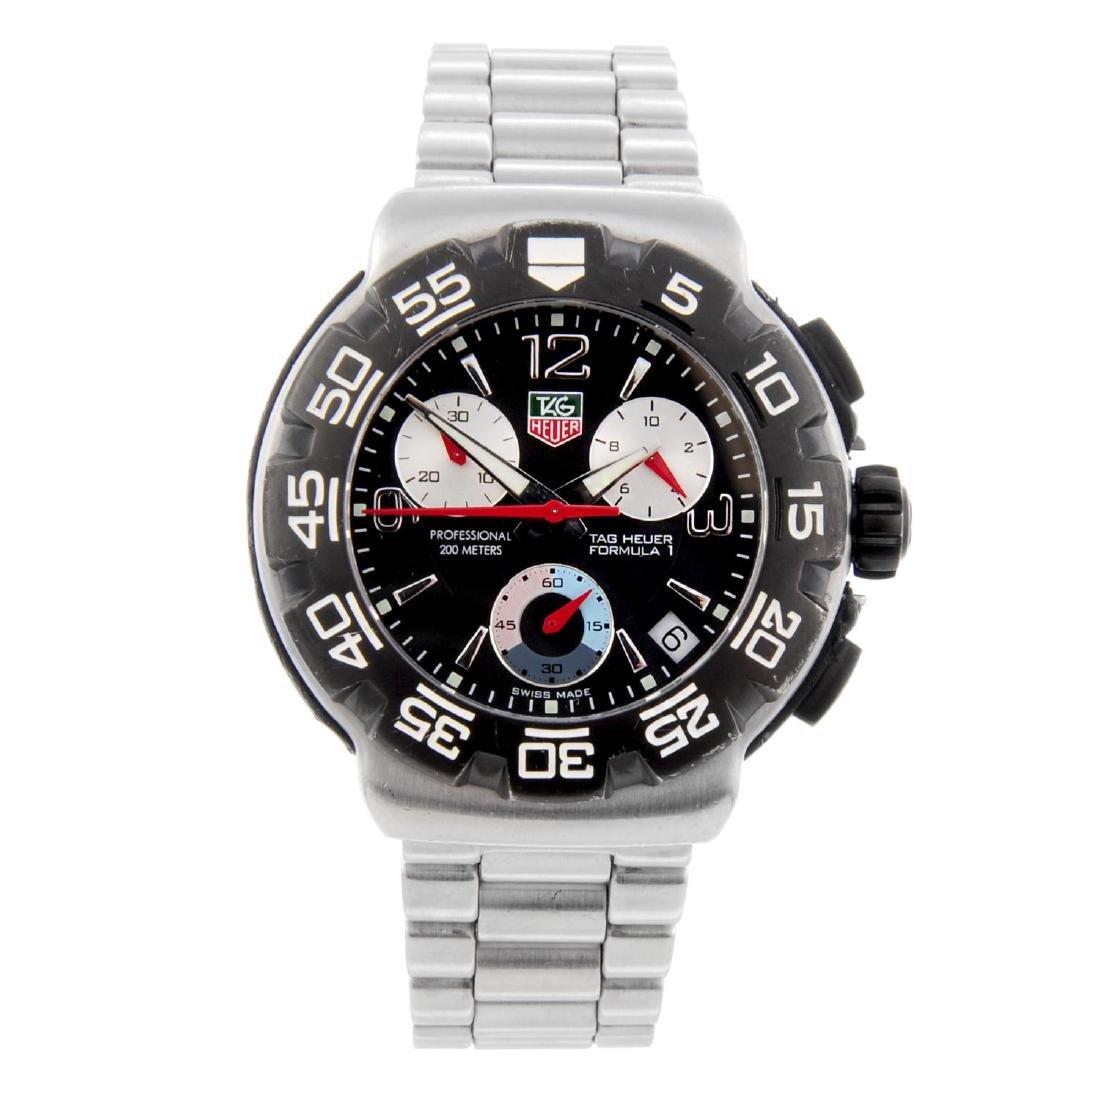 TAG HEUER - a gentleman's Formula 1 chronograph